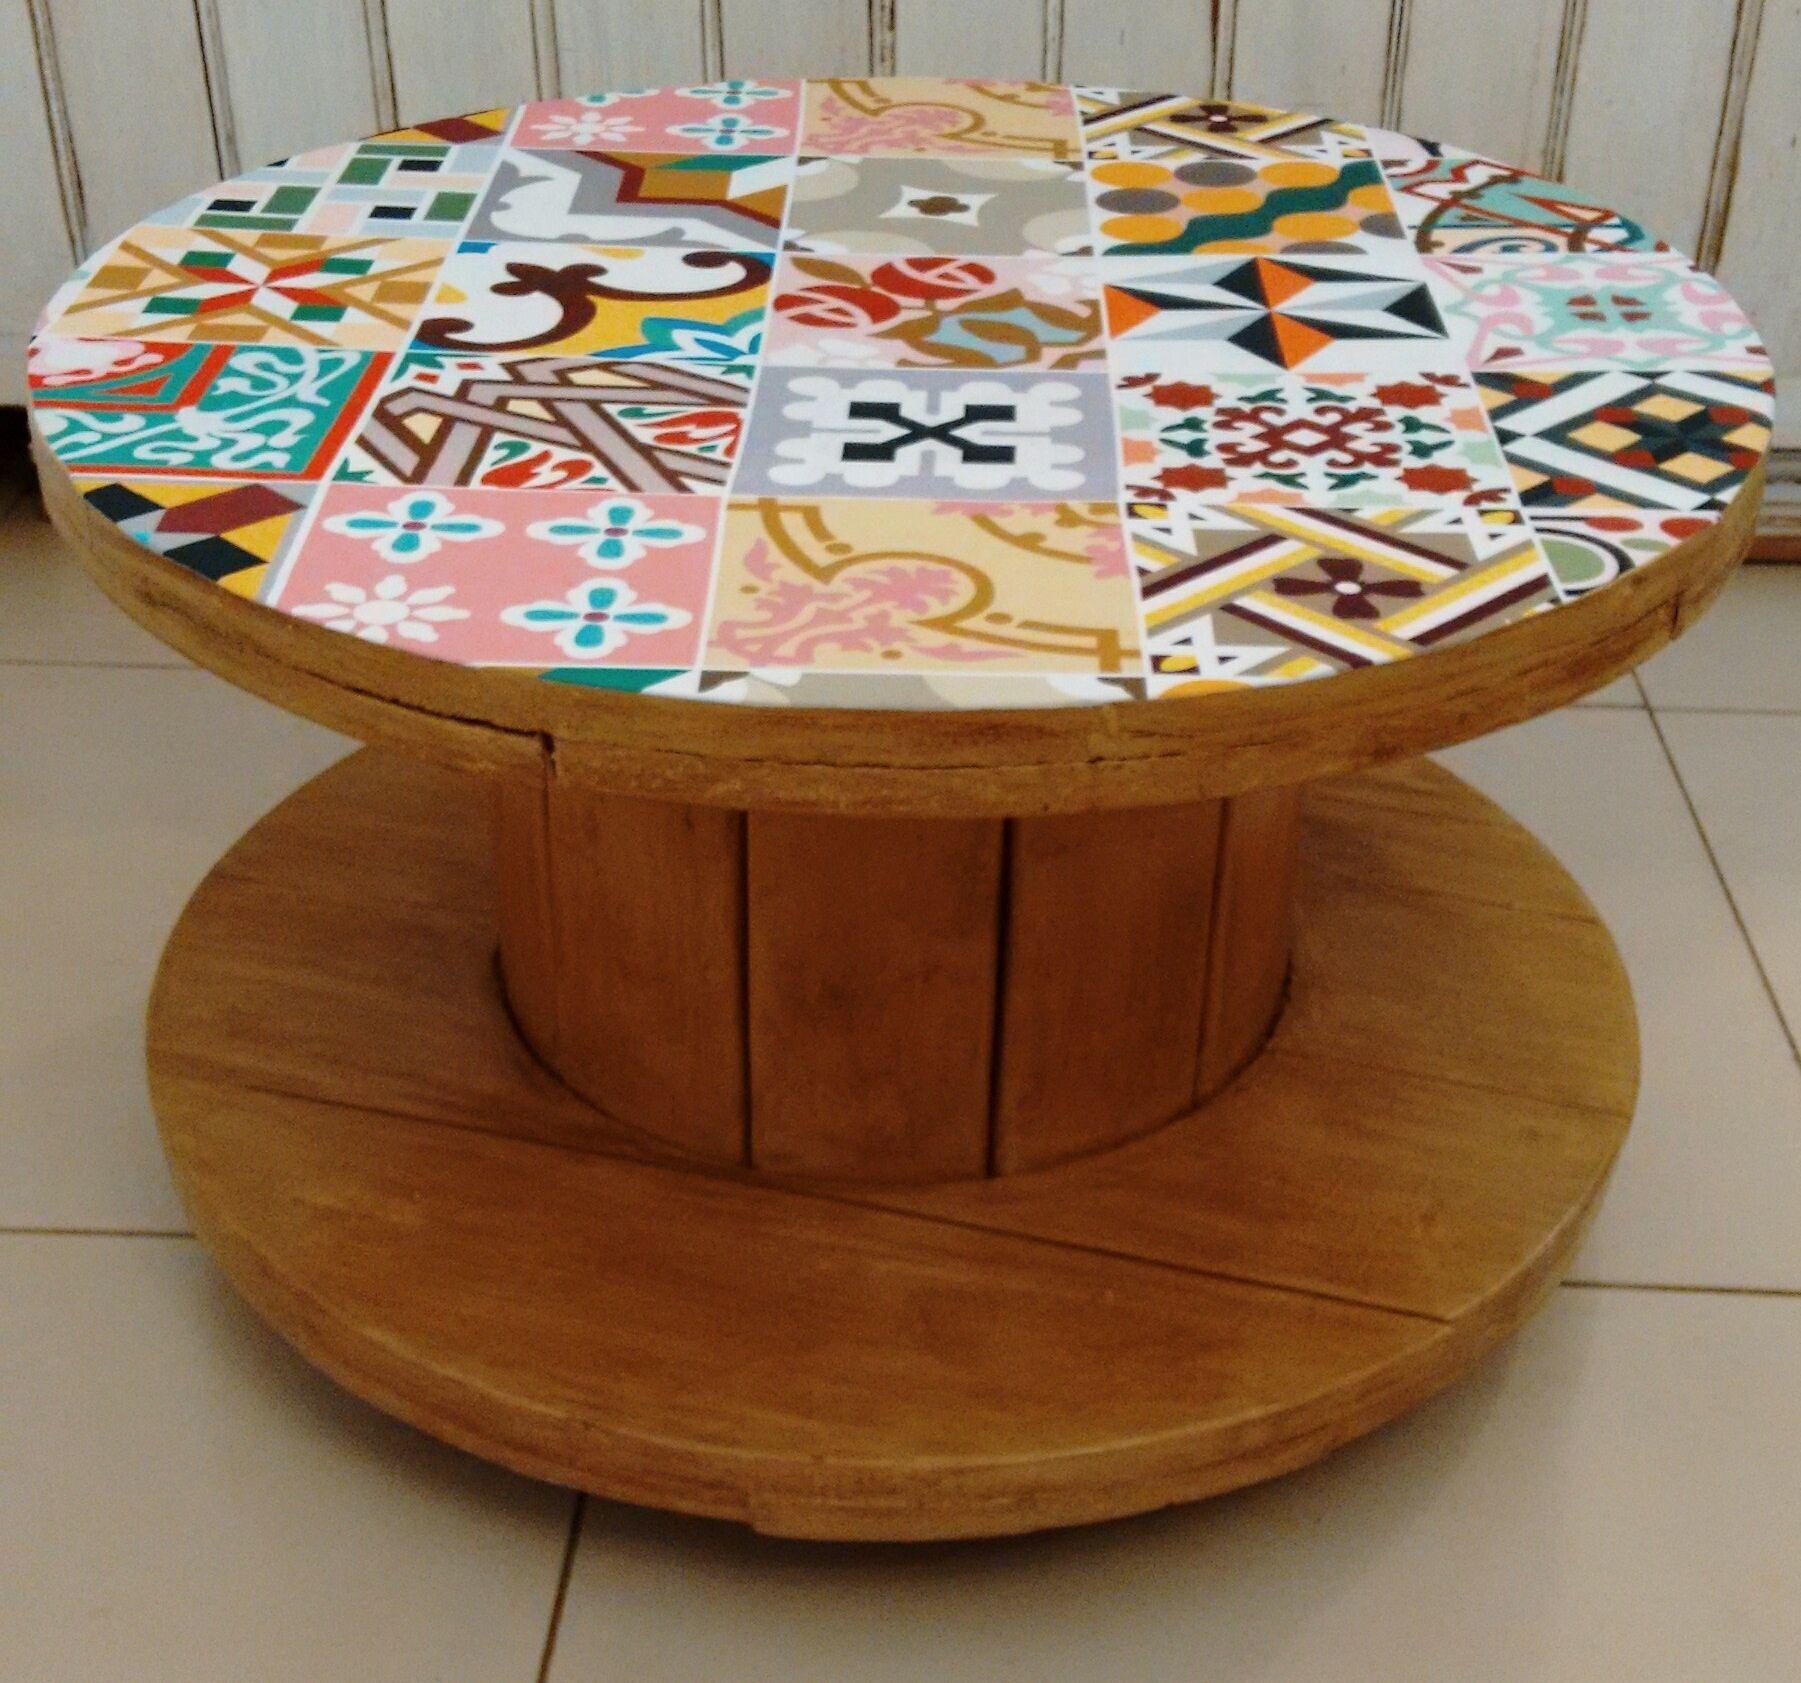 Mesa Carretel Madeira Pesquisa Google Muebles Pinterest  # Muebles Cubanos De Madera